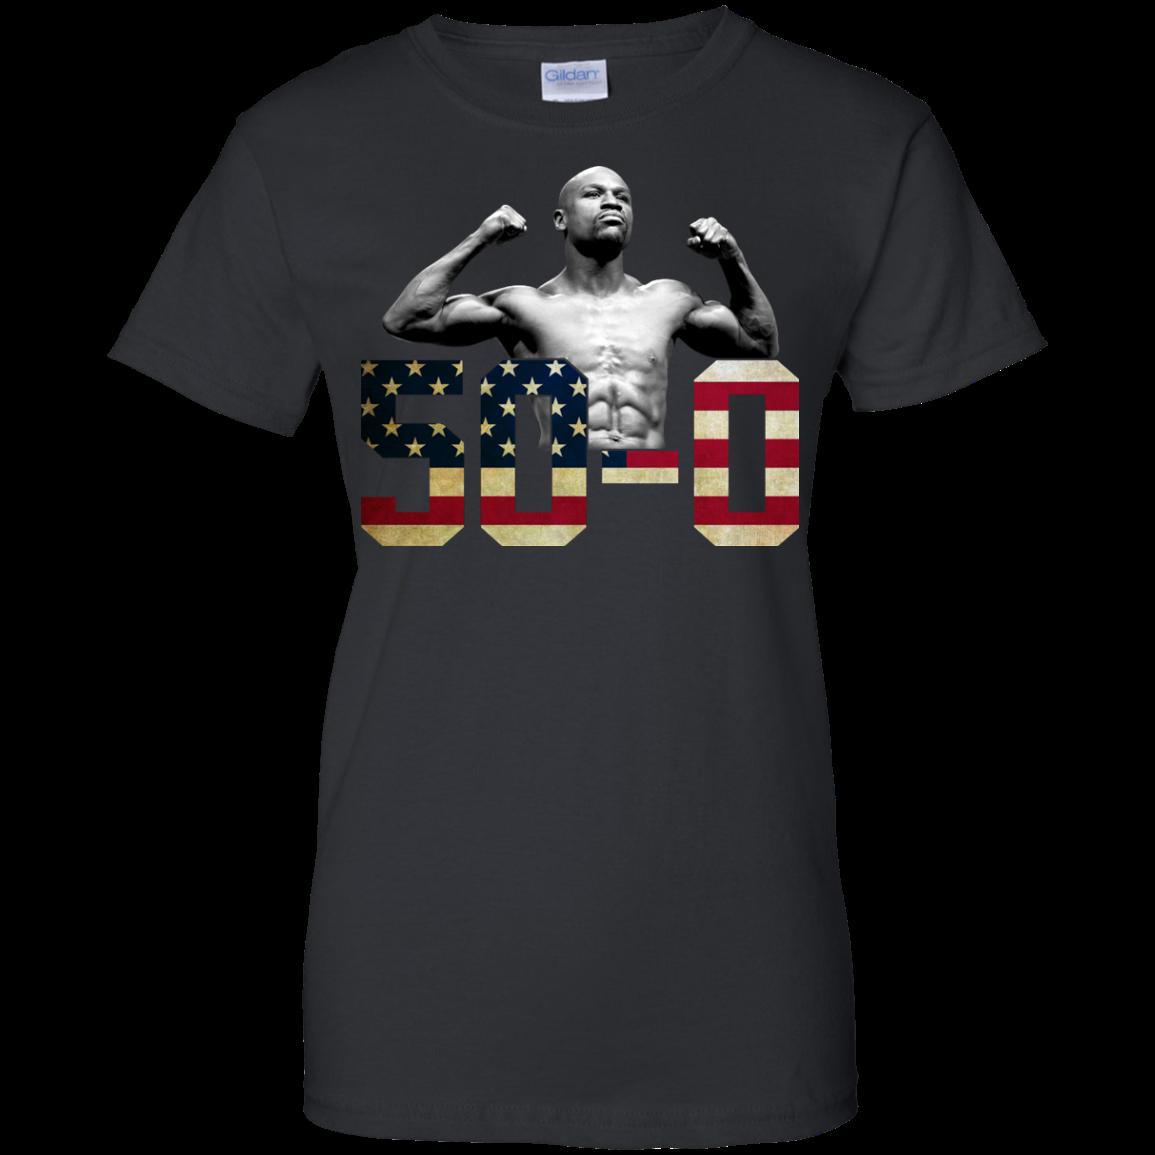 image 512px Floyd Mayweather 50 0 Shirt, Hoodies, Tank